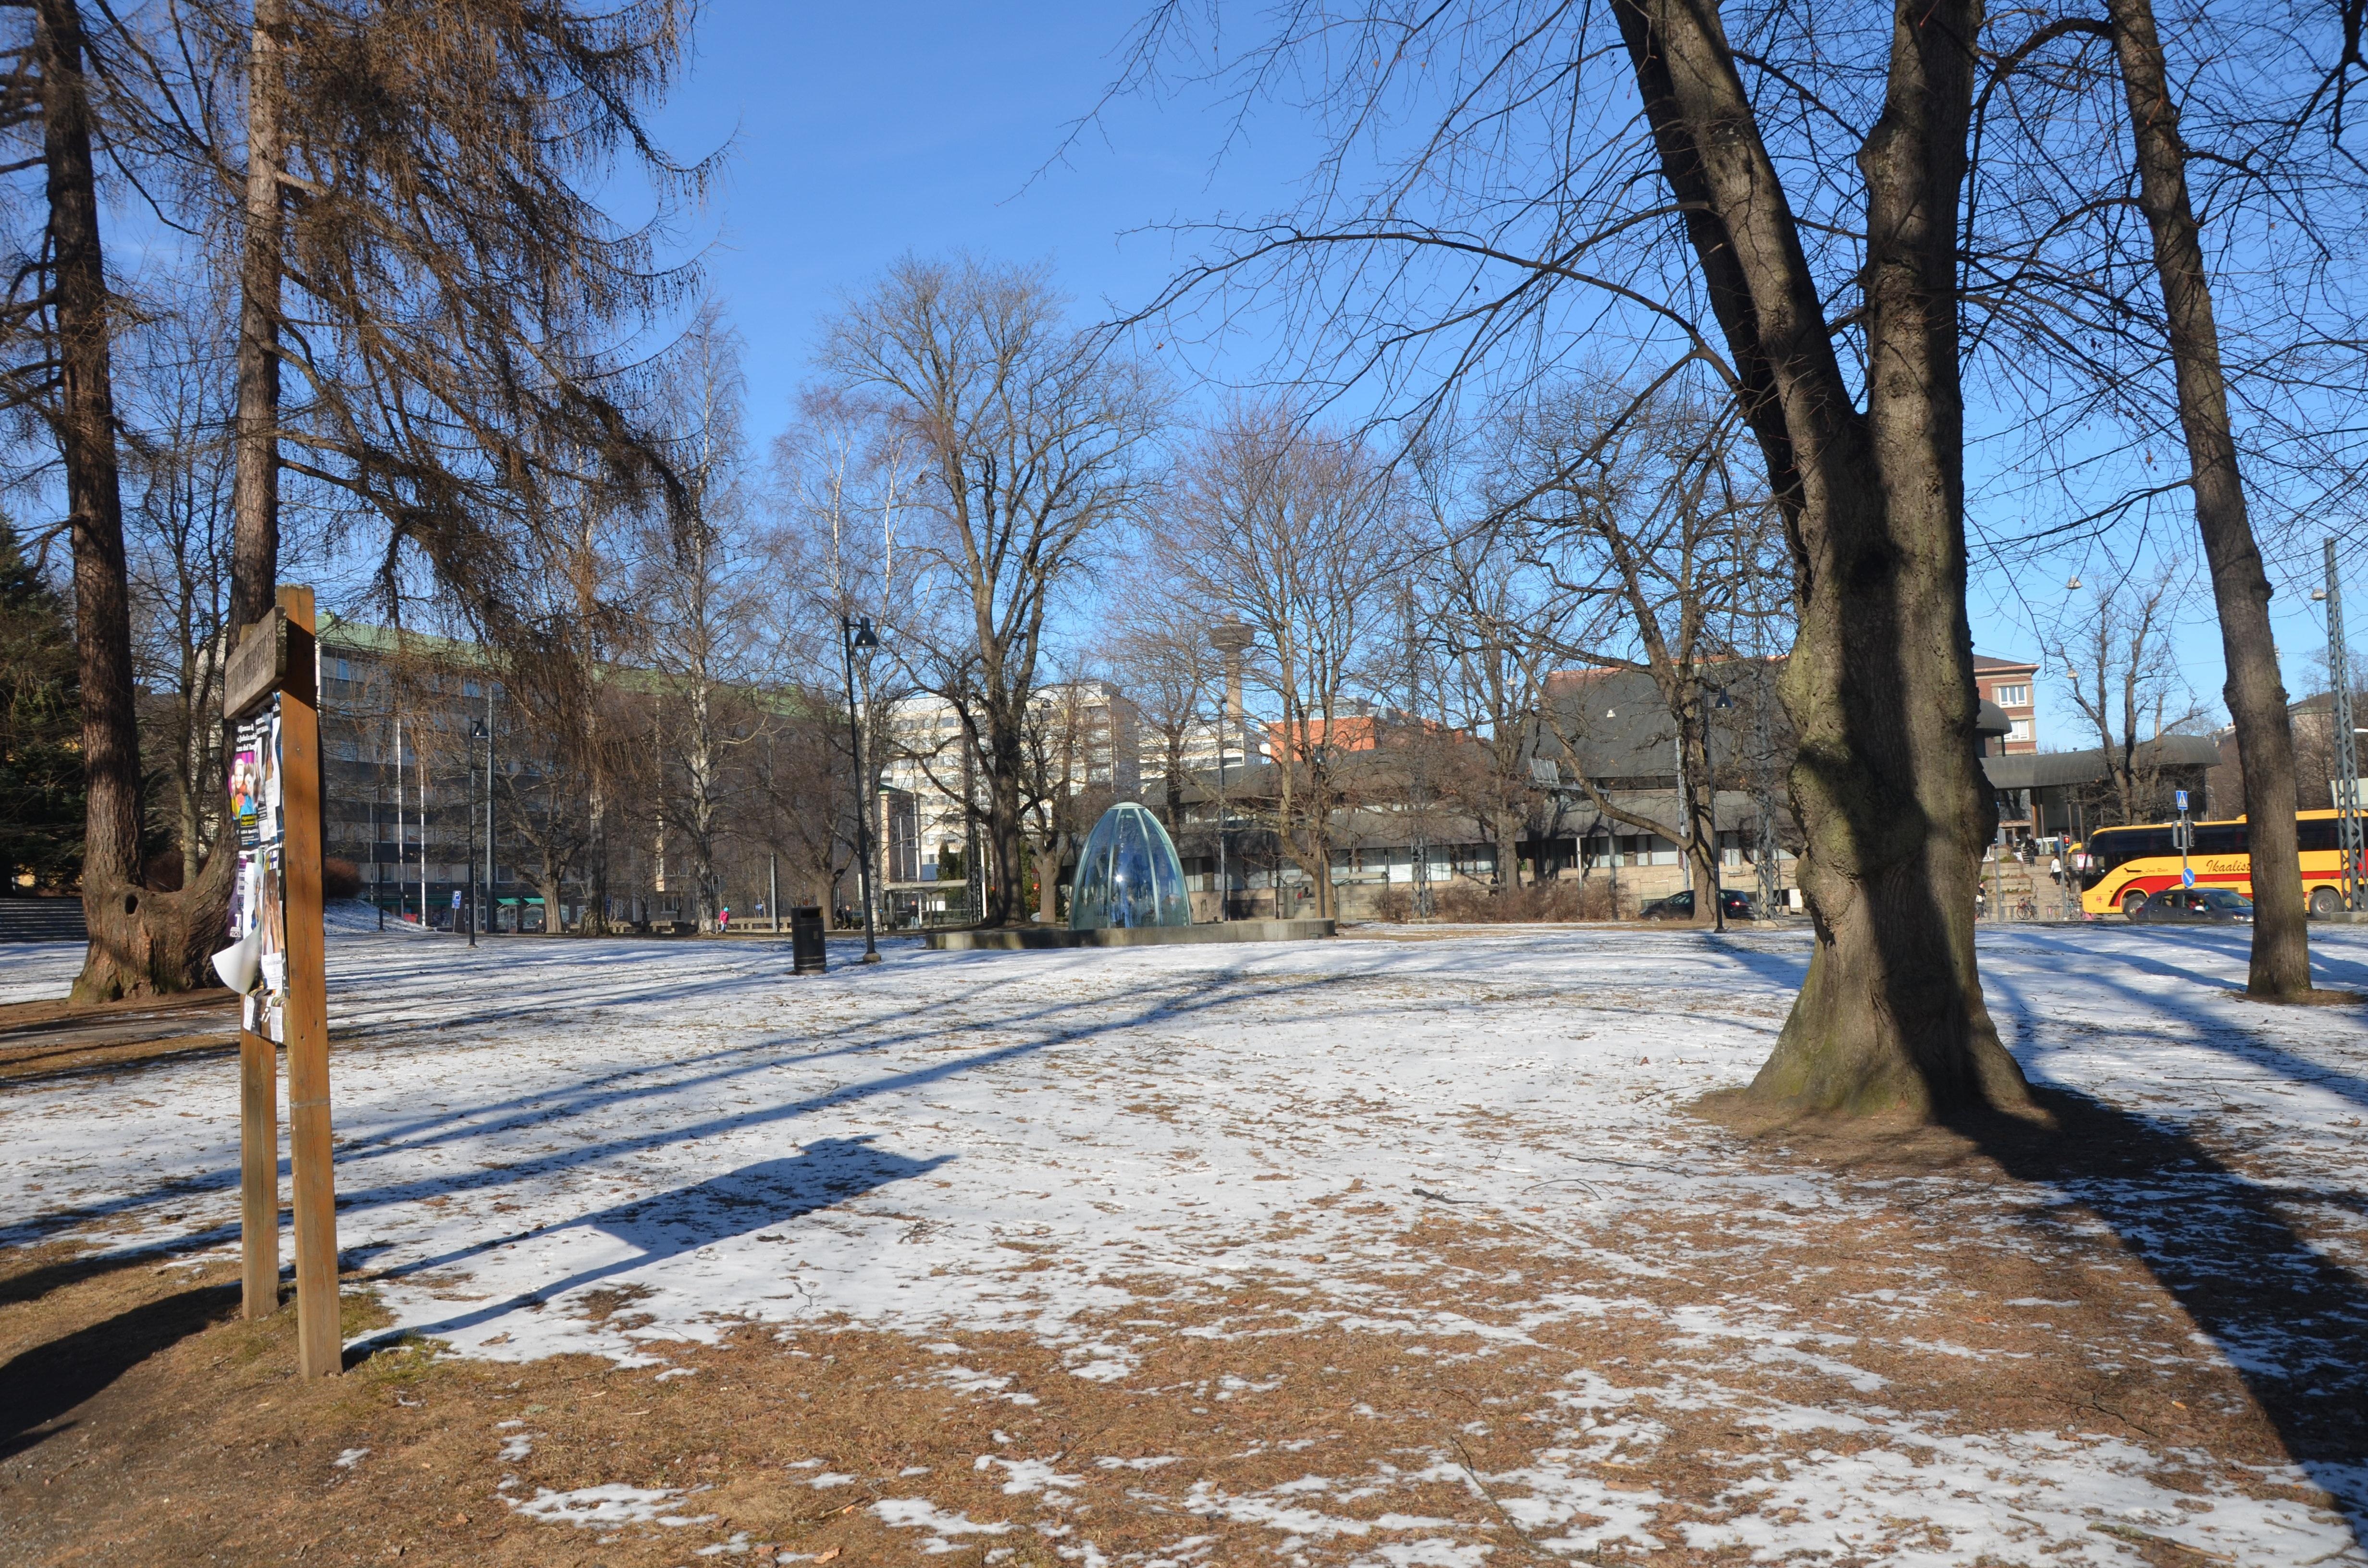 Free Images Tree Snow Winter Europe Park Weather Season